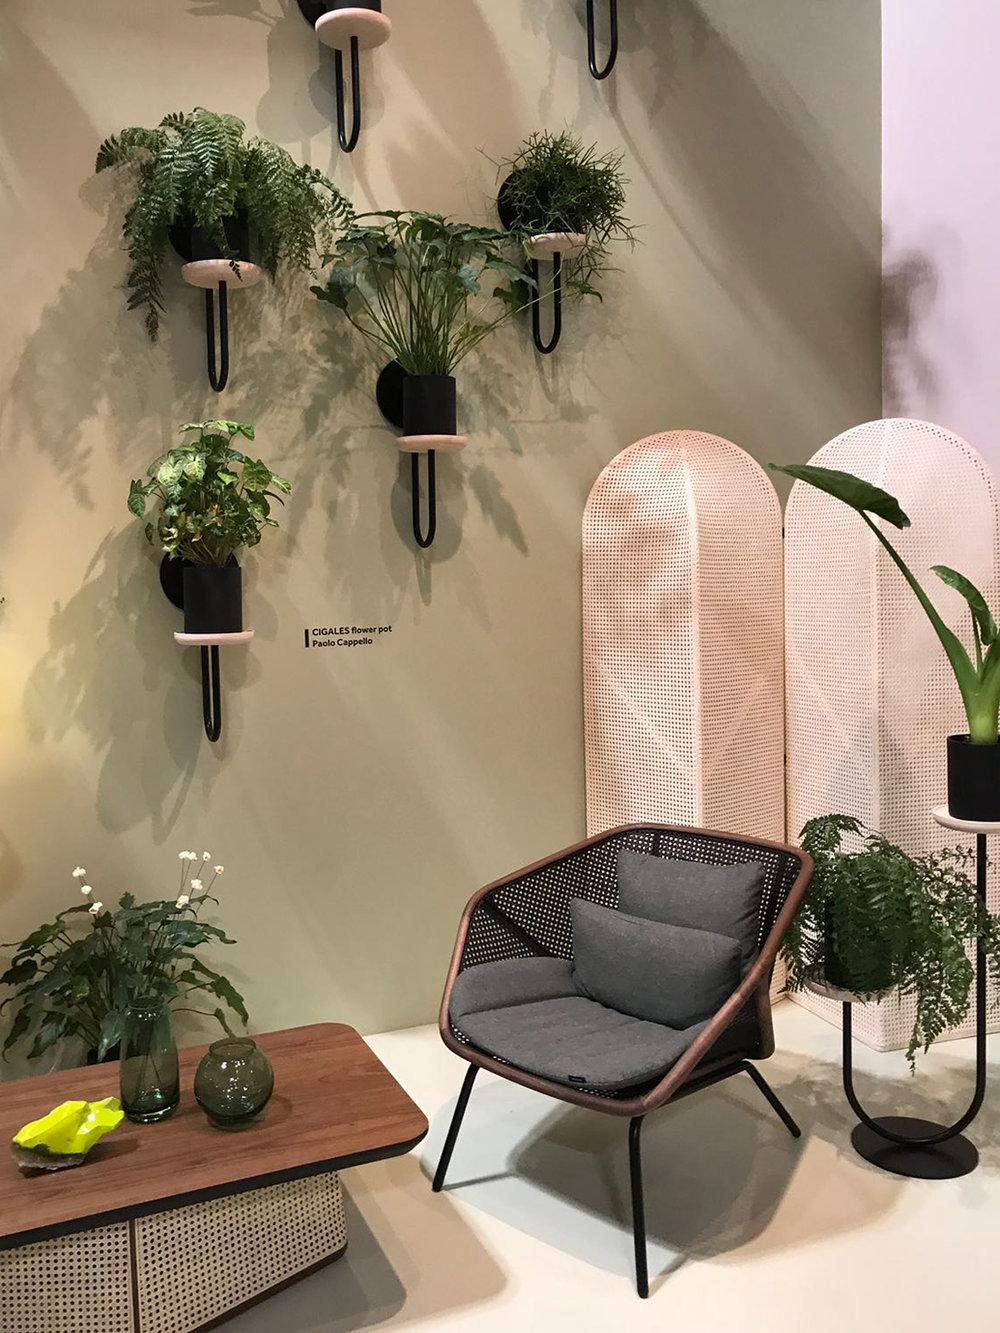 A_LONDON_Salone_del_Mobile_Milan_Design_Week_02.jpg